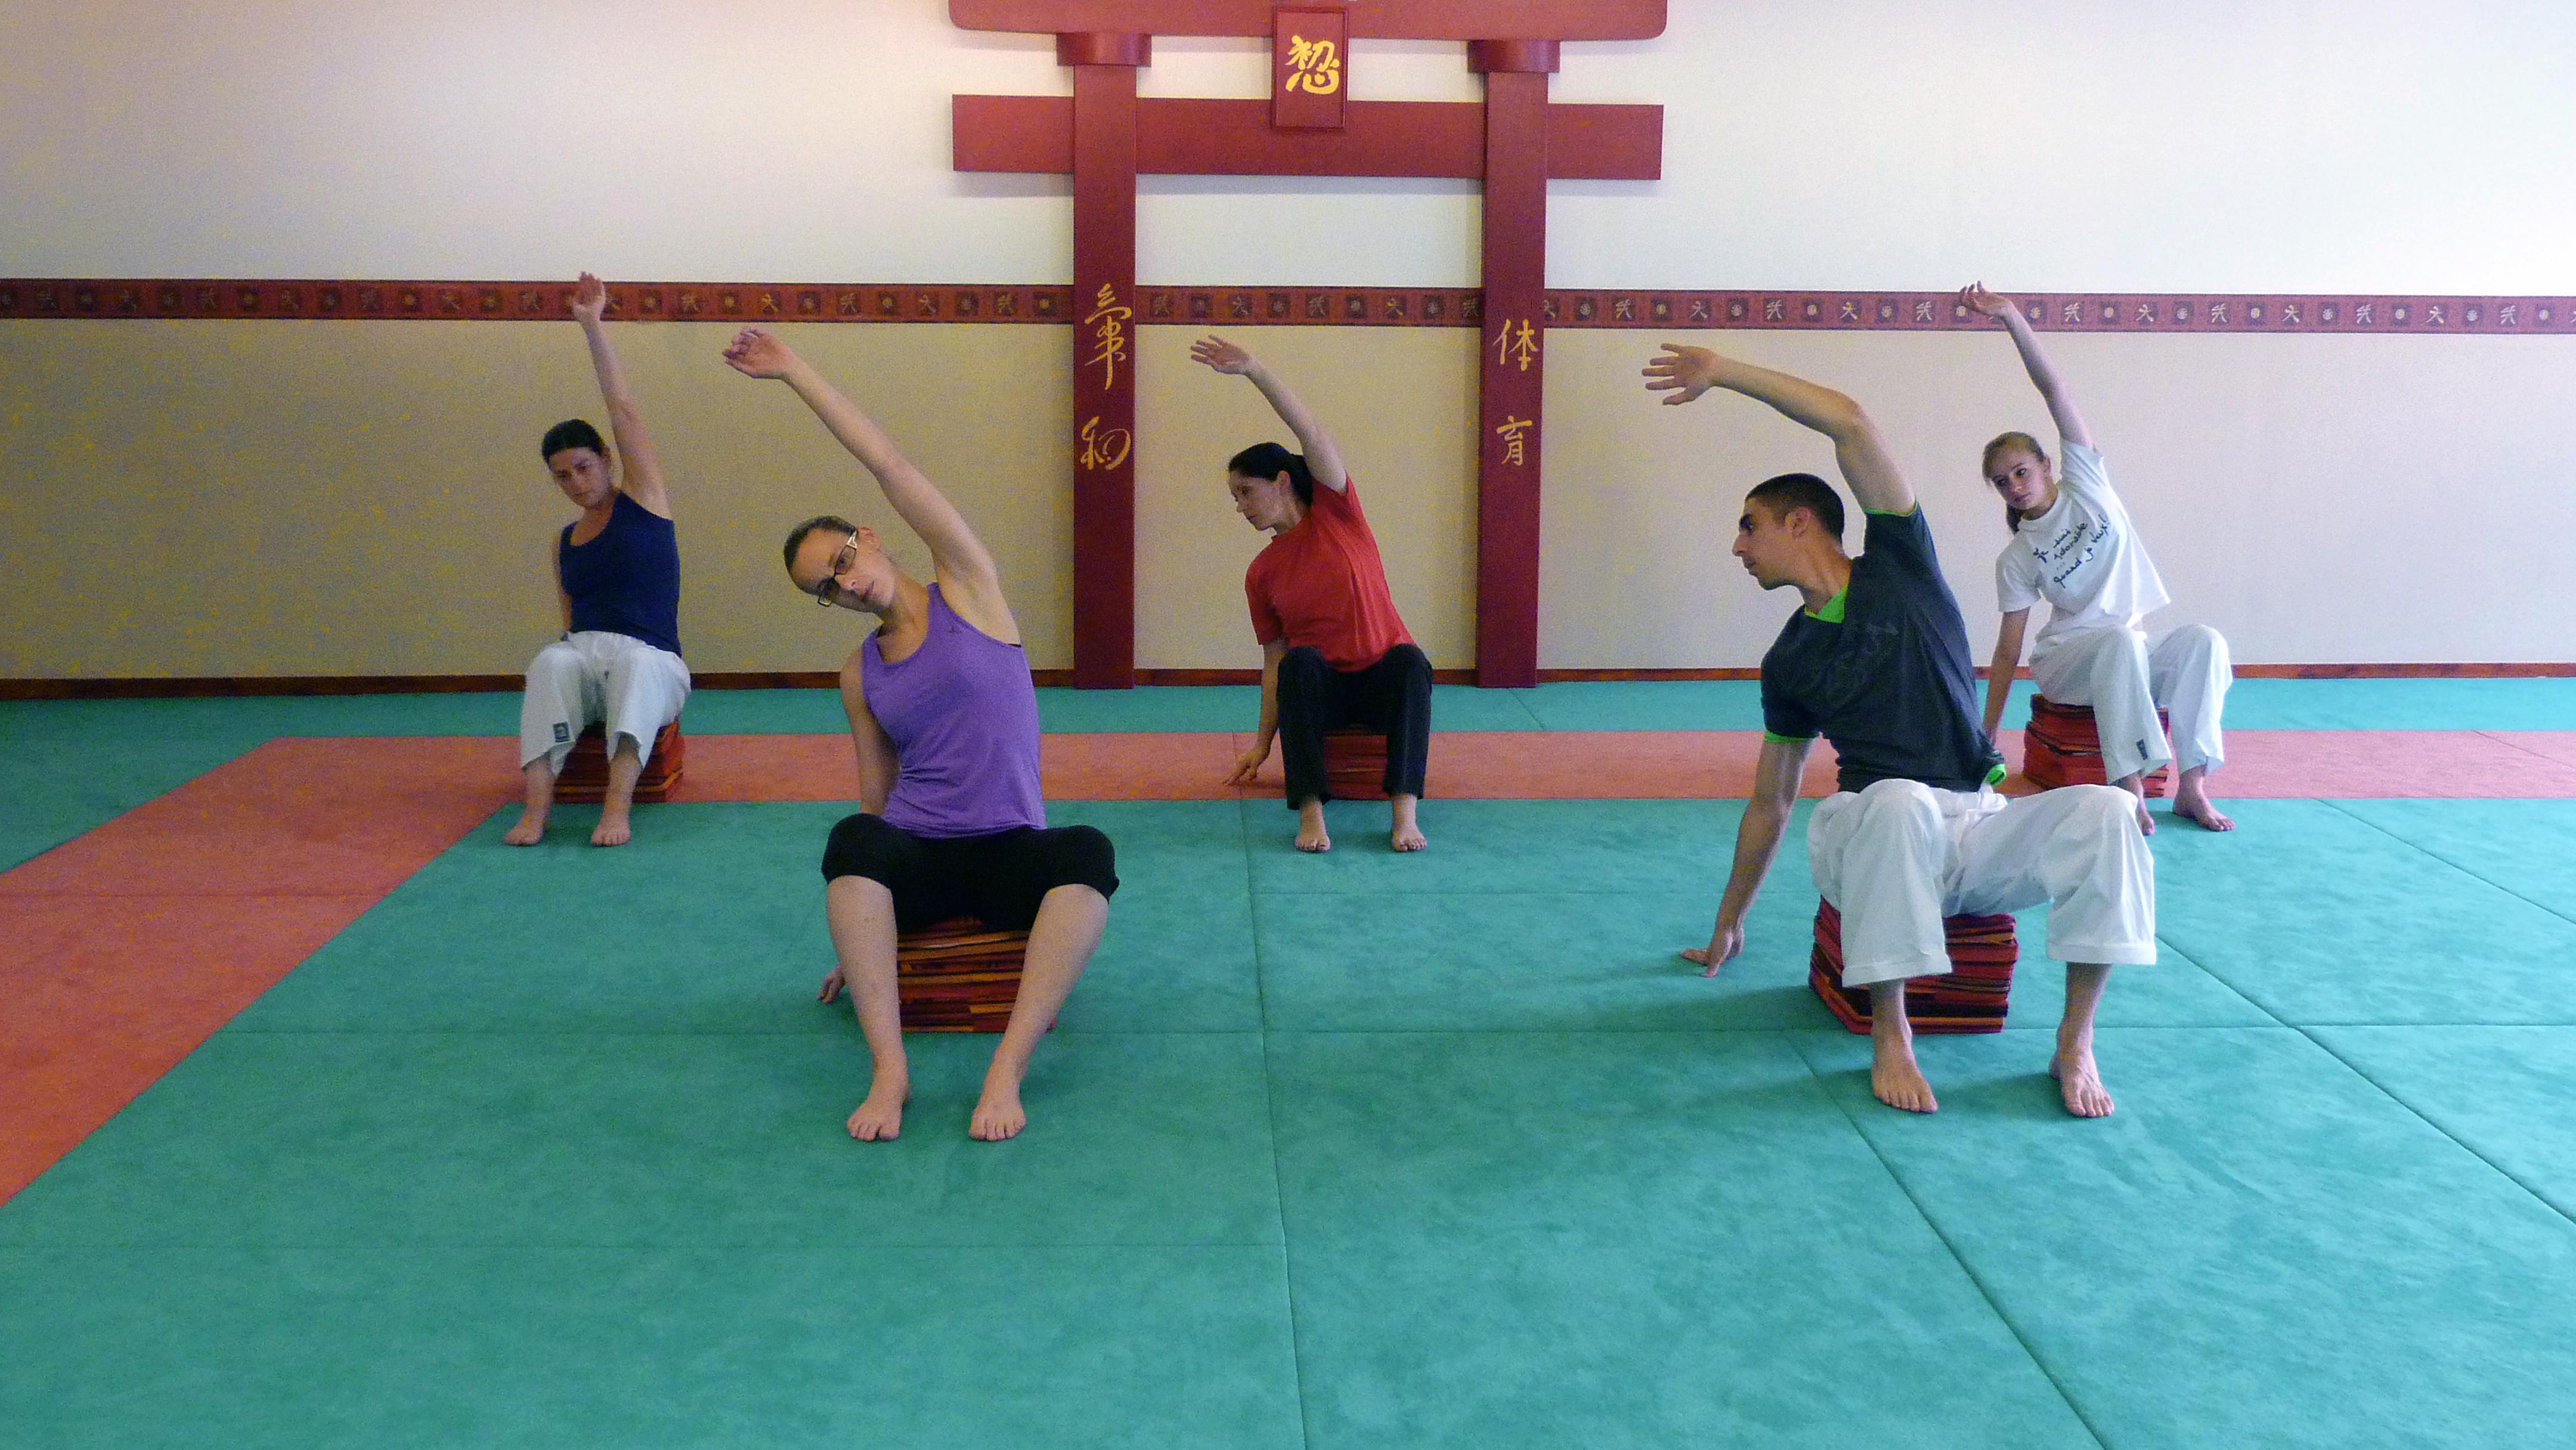 Stretch arts martiaux2 shoshin arts martiaux vannes morbihan for Art martiaux